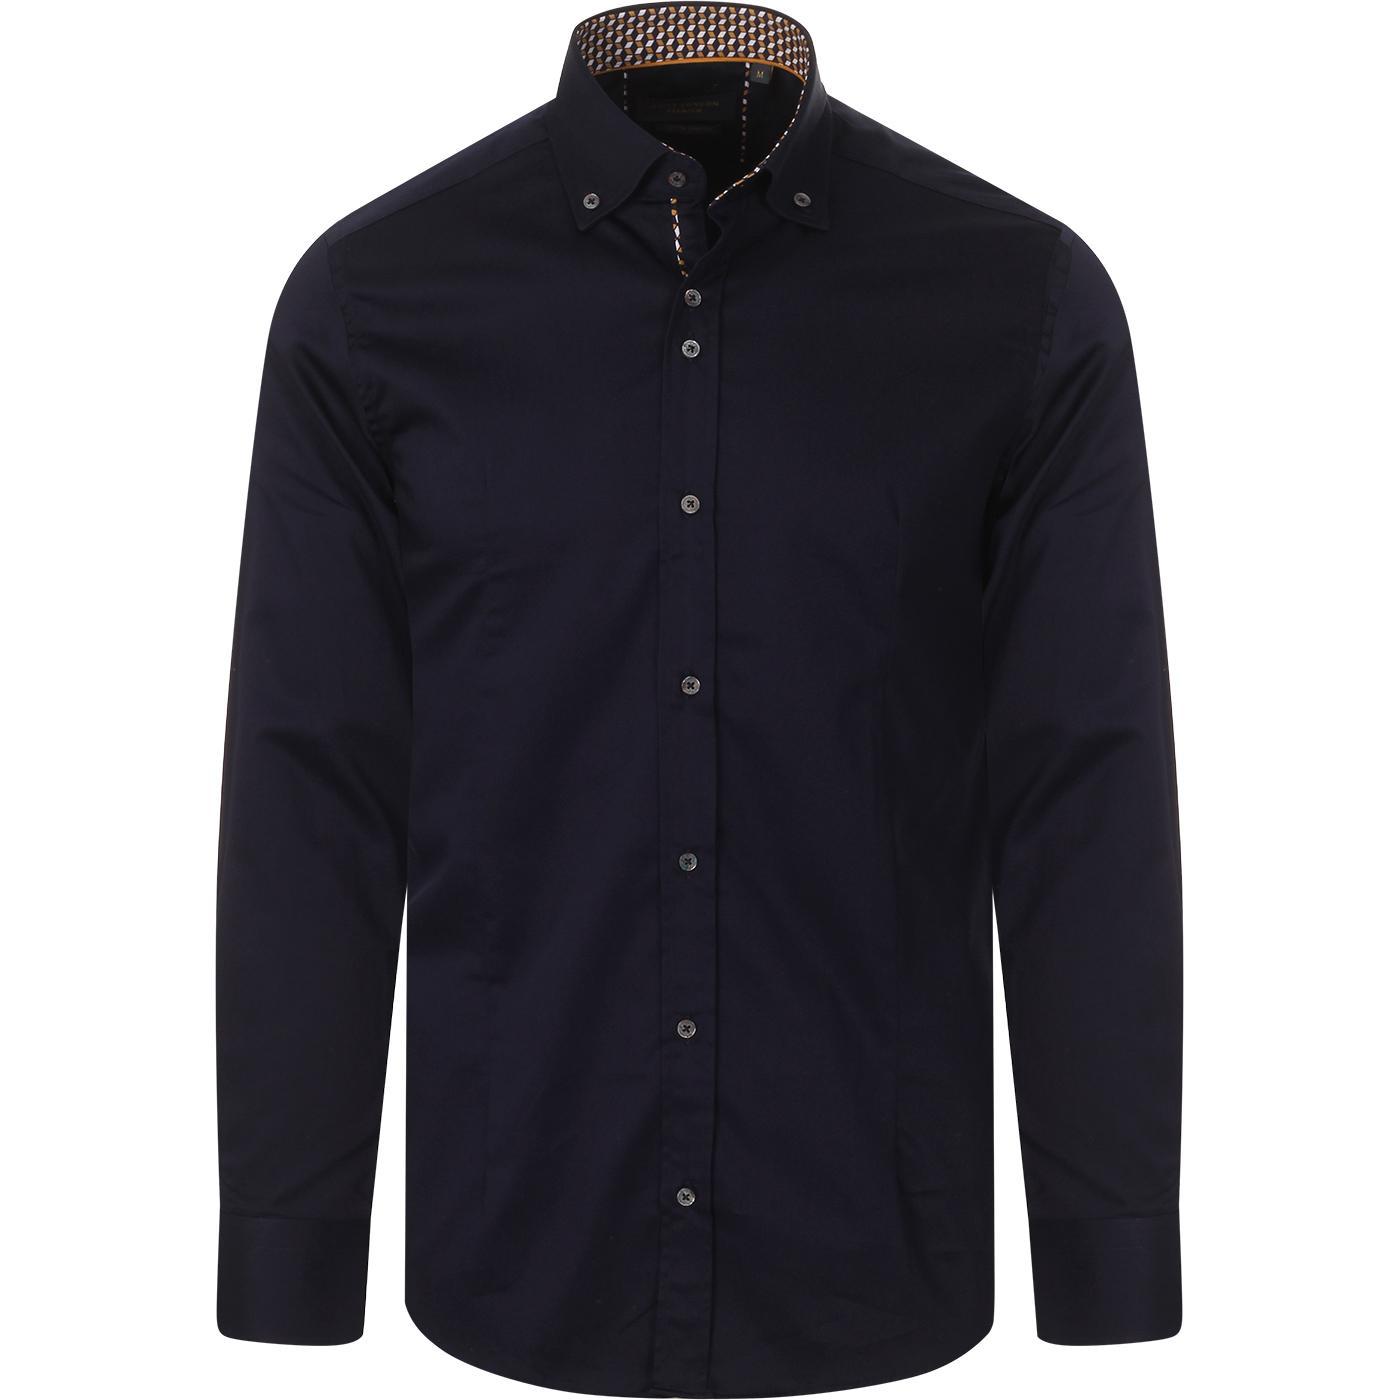 GUIDE LONDON Smart Plain BD Shirt w/ Geo Trim (N)